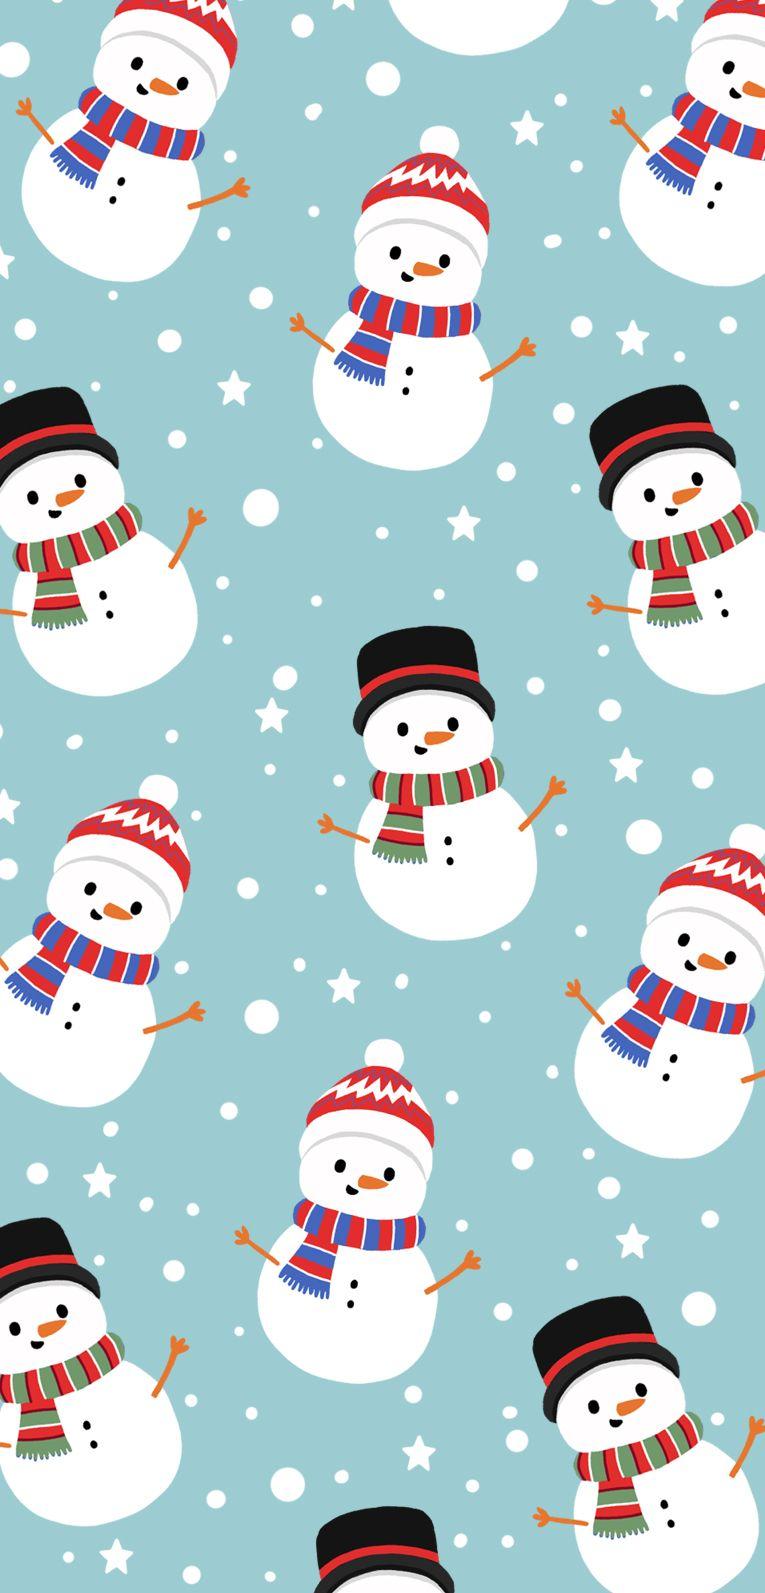 A Joyful Christmas With Gocase Wallpapers Wallpaper Iphone Christmas Christmas Phone Wallpaper Christmas Wallpaper